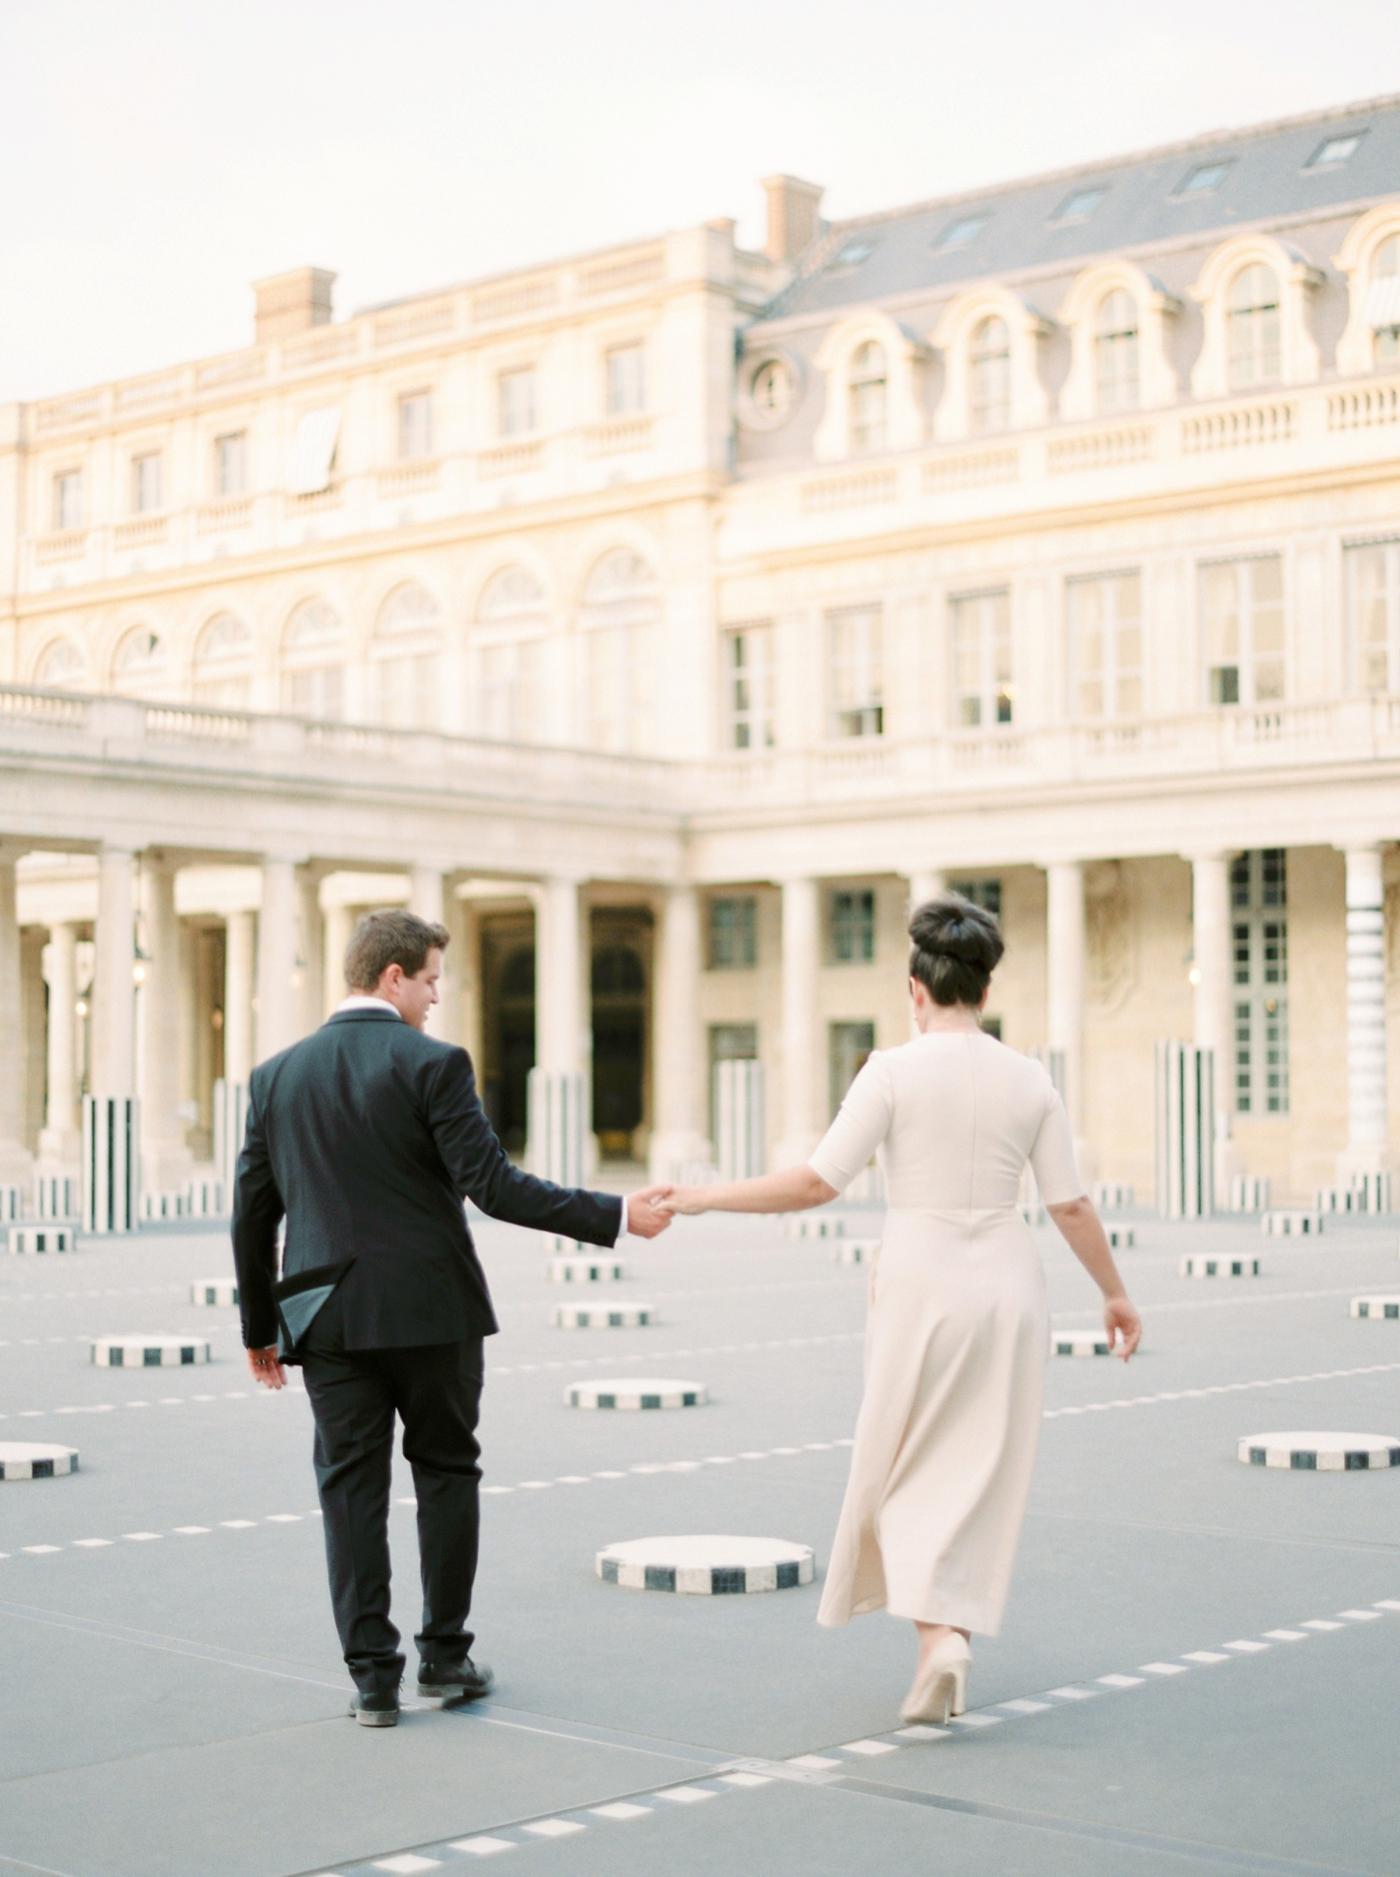 Paris weding photographers   pre wedding engagement session   fine art film photographer justine milton